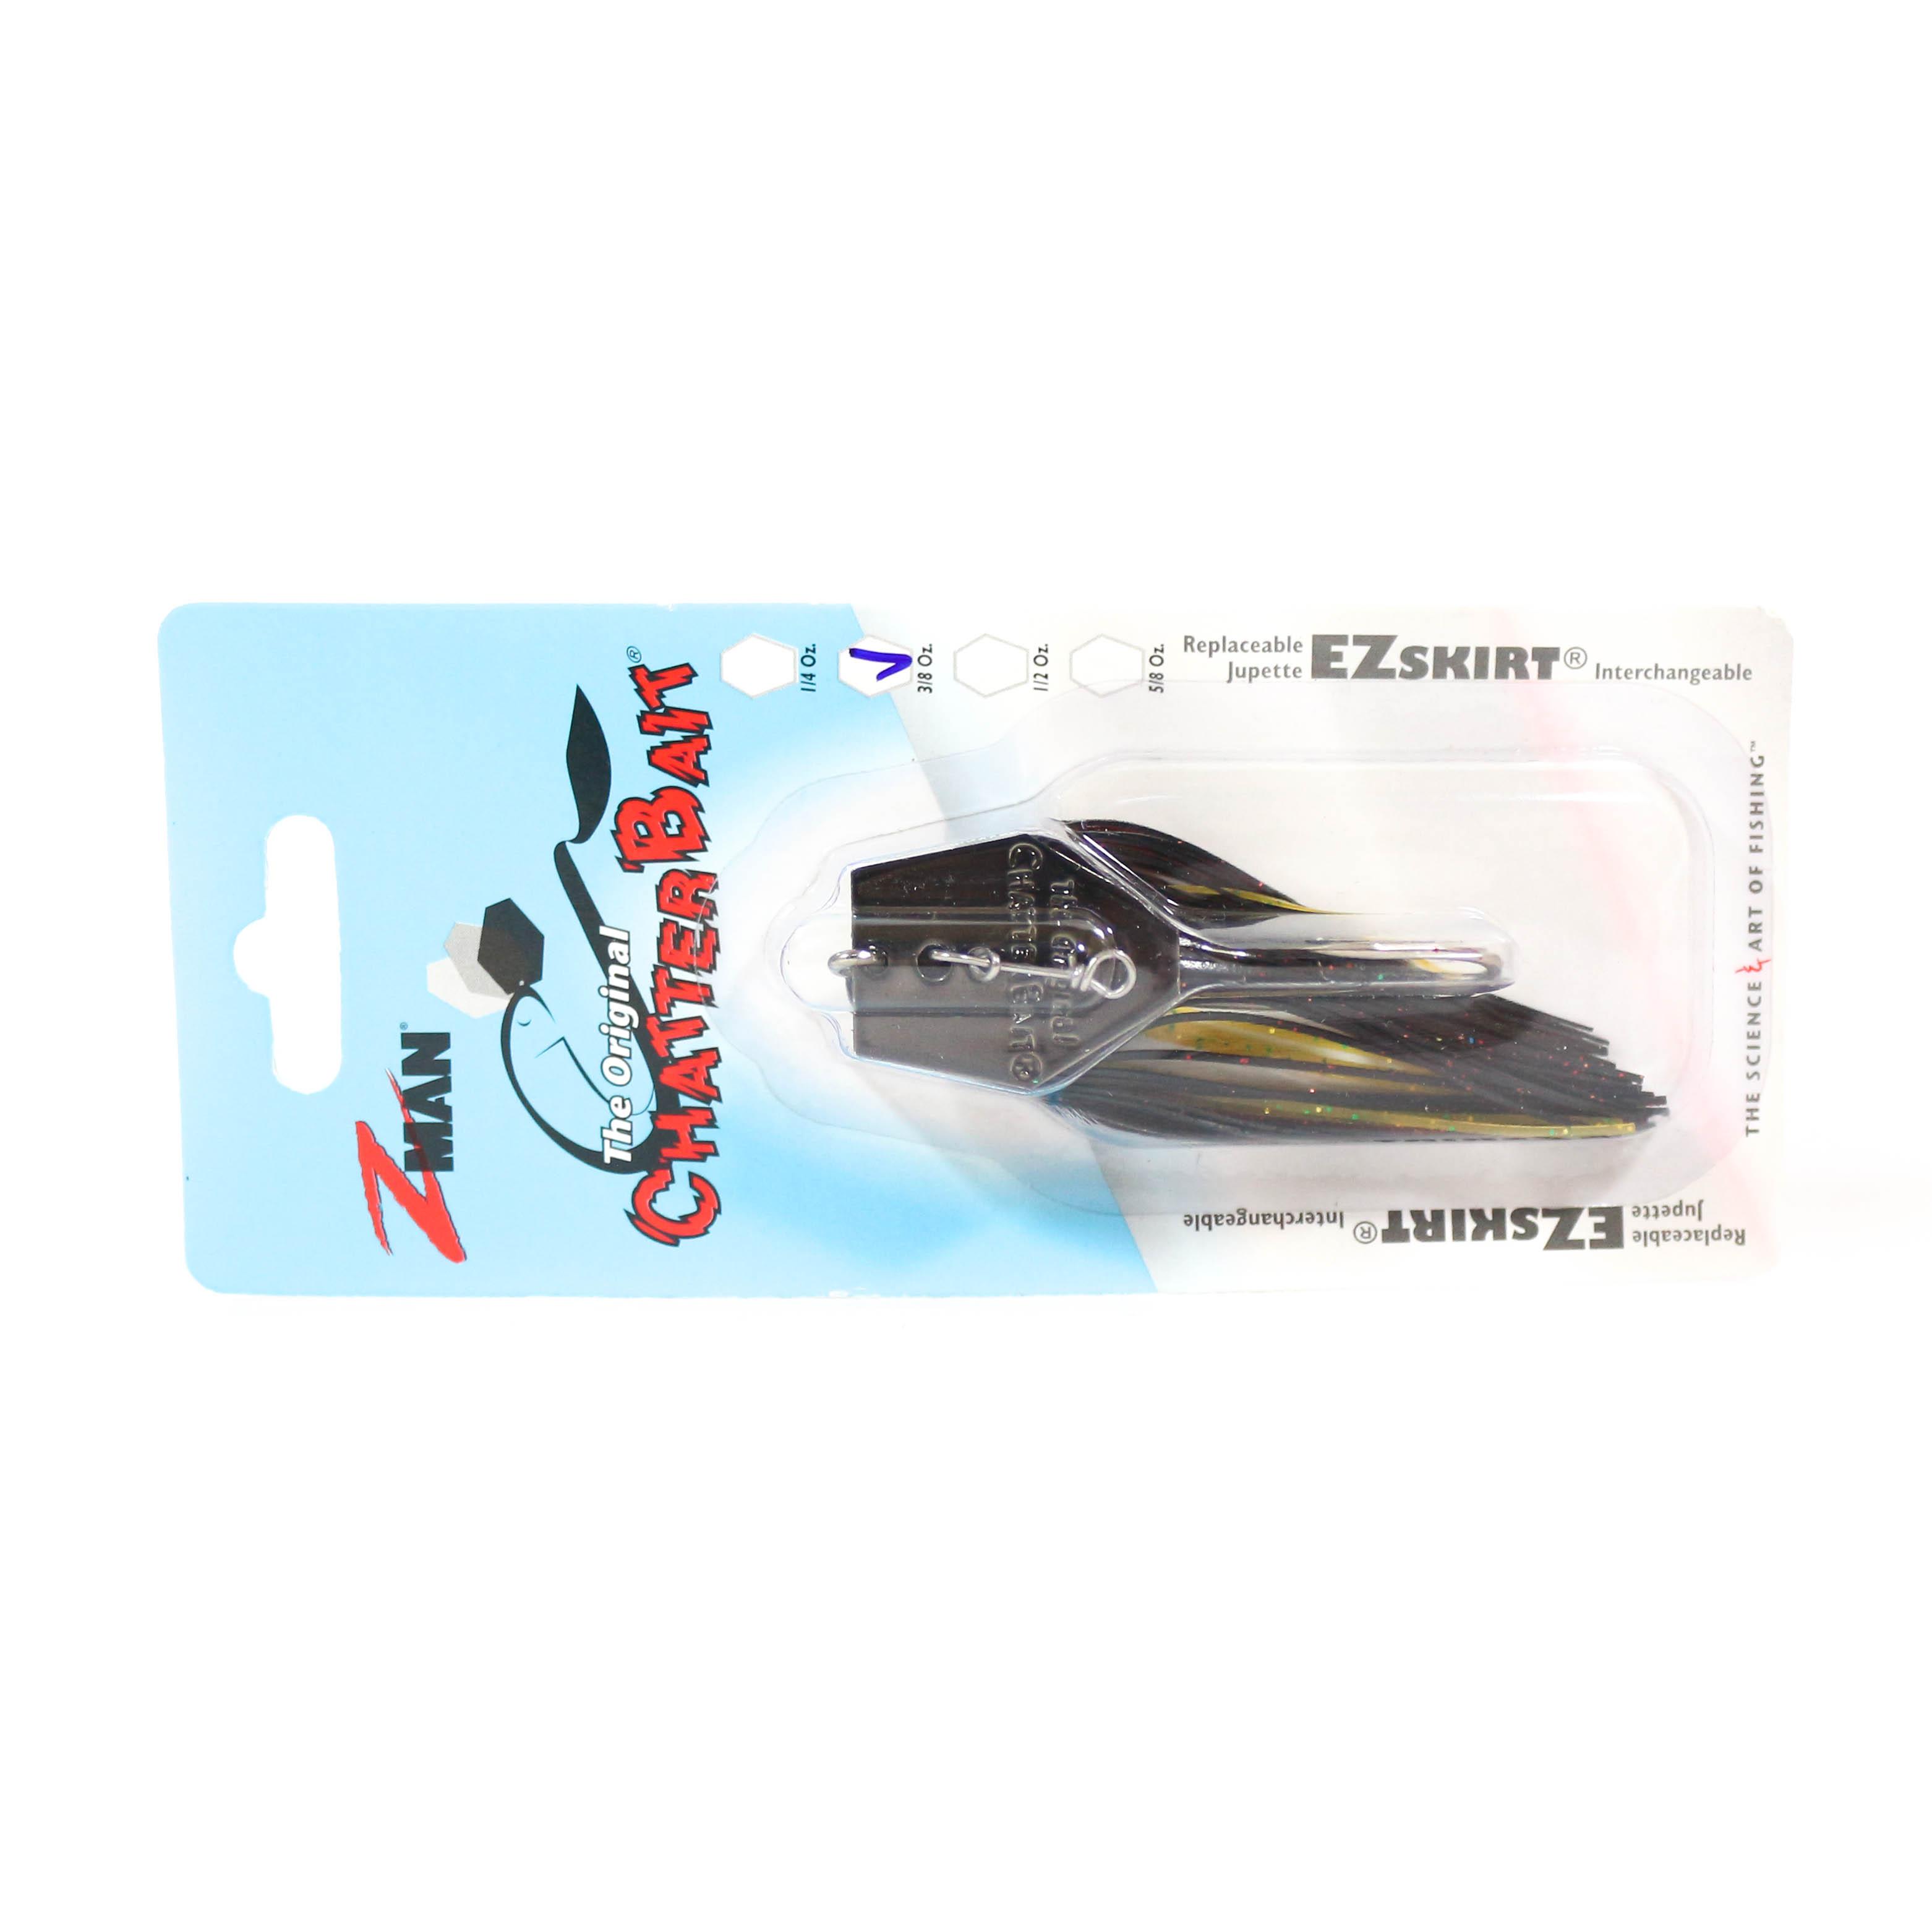 Zman Chatterbait 3/8 oz Sinking Lure Bayou Craw (0785)